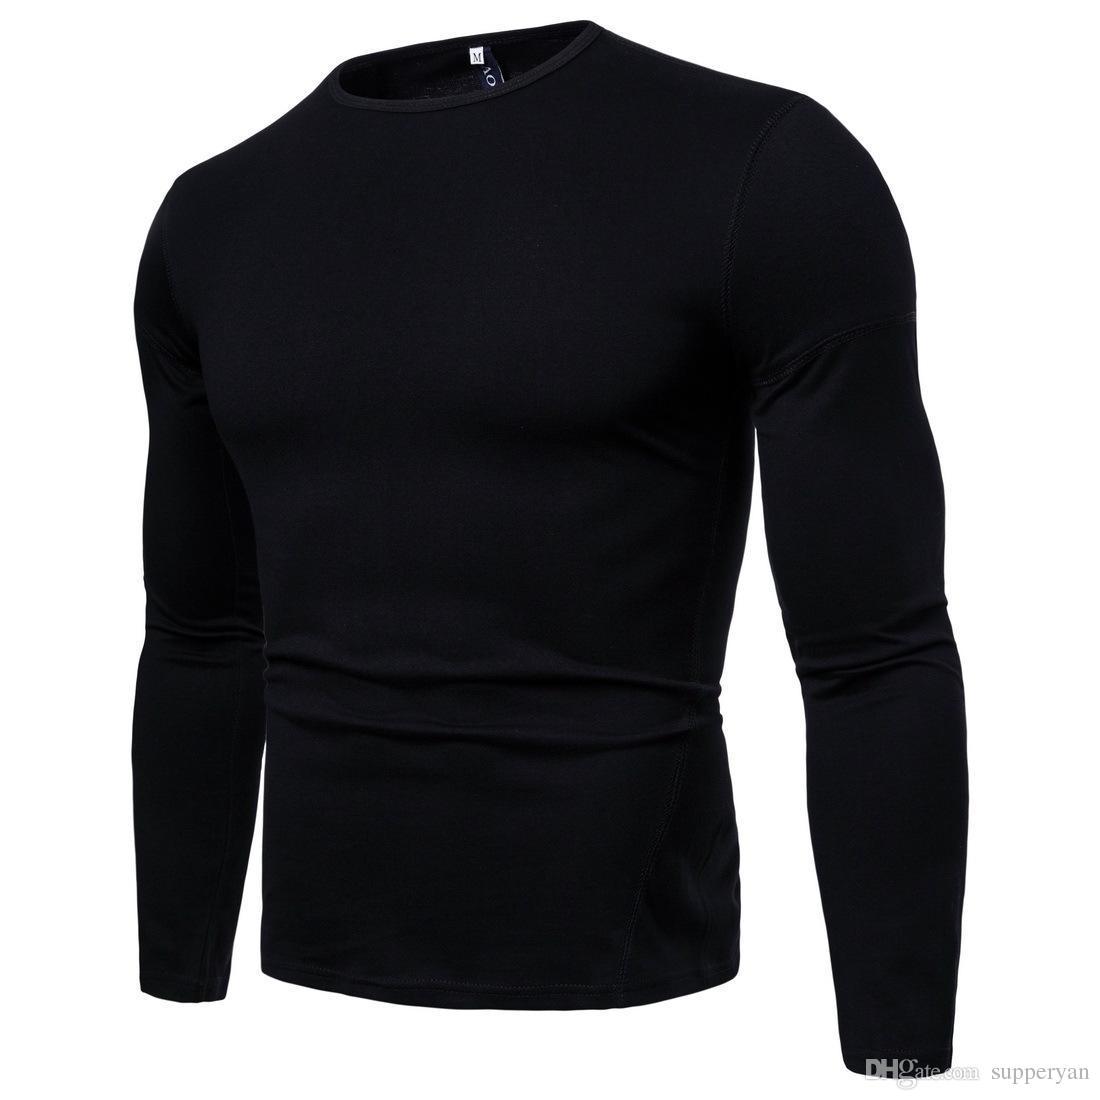 fee3d2908cb712 Brand Long Sleeve T Shirts Men Solid V Neck Plain Casual Bottom Men S Tee  Shirt Male Tops Autumn Winter T Shirts Tops J181122 Buy T Shirts Online  Funny Tee ...